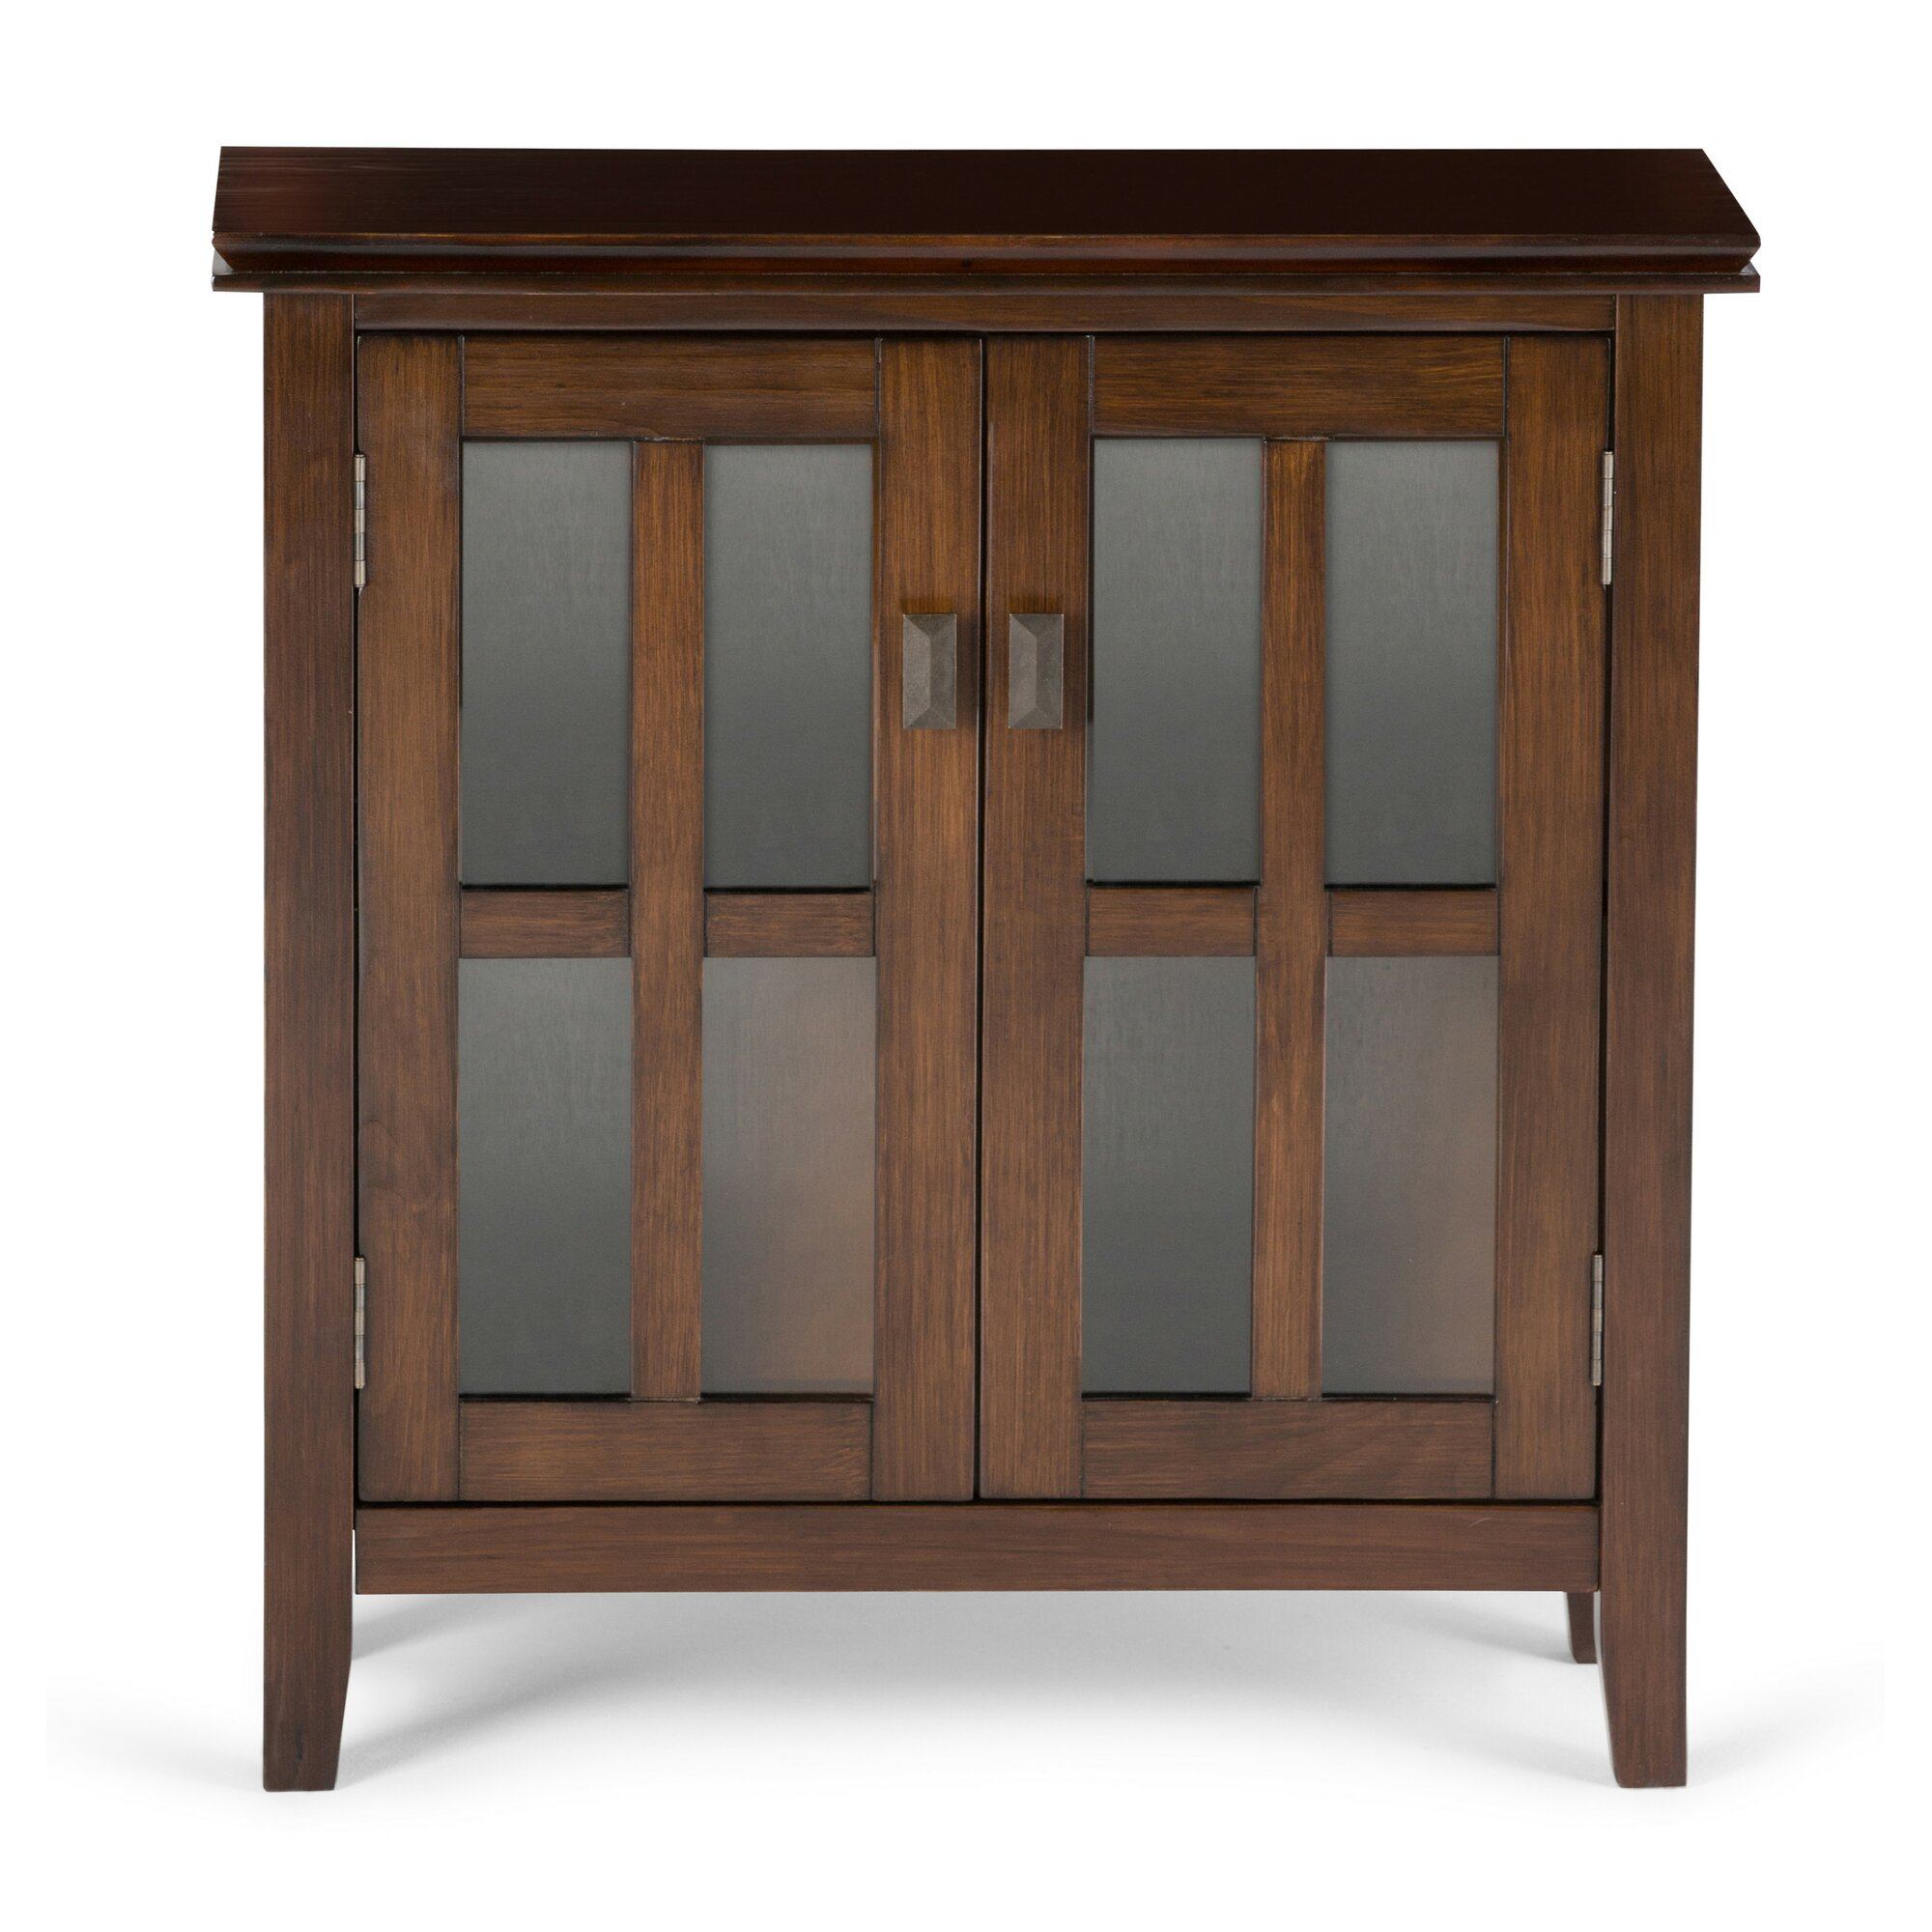 Simpli Home Artisan 2 Door Storage Cabinet & Reviews